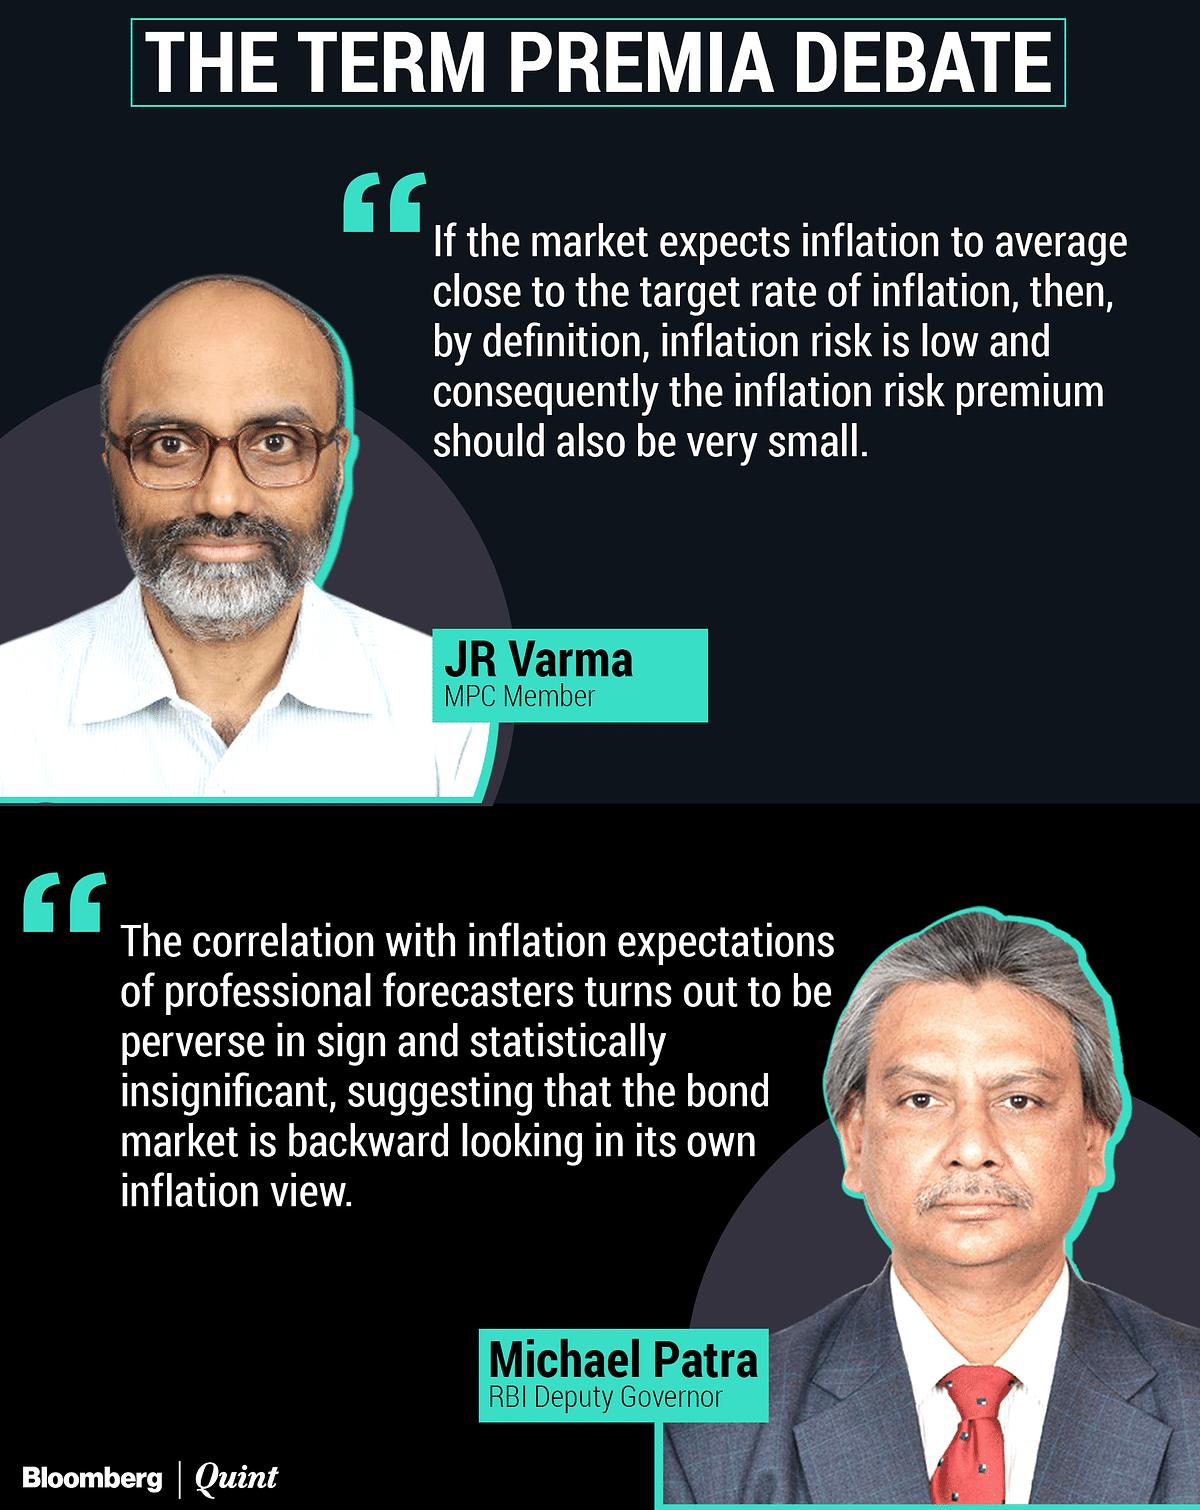 Term Premia Debate: RBI's Michael Patra Counters JR Varma's View